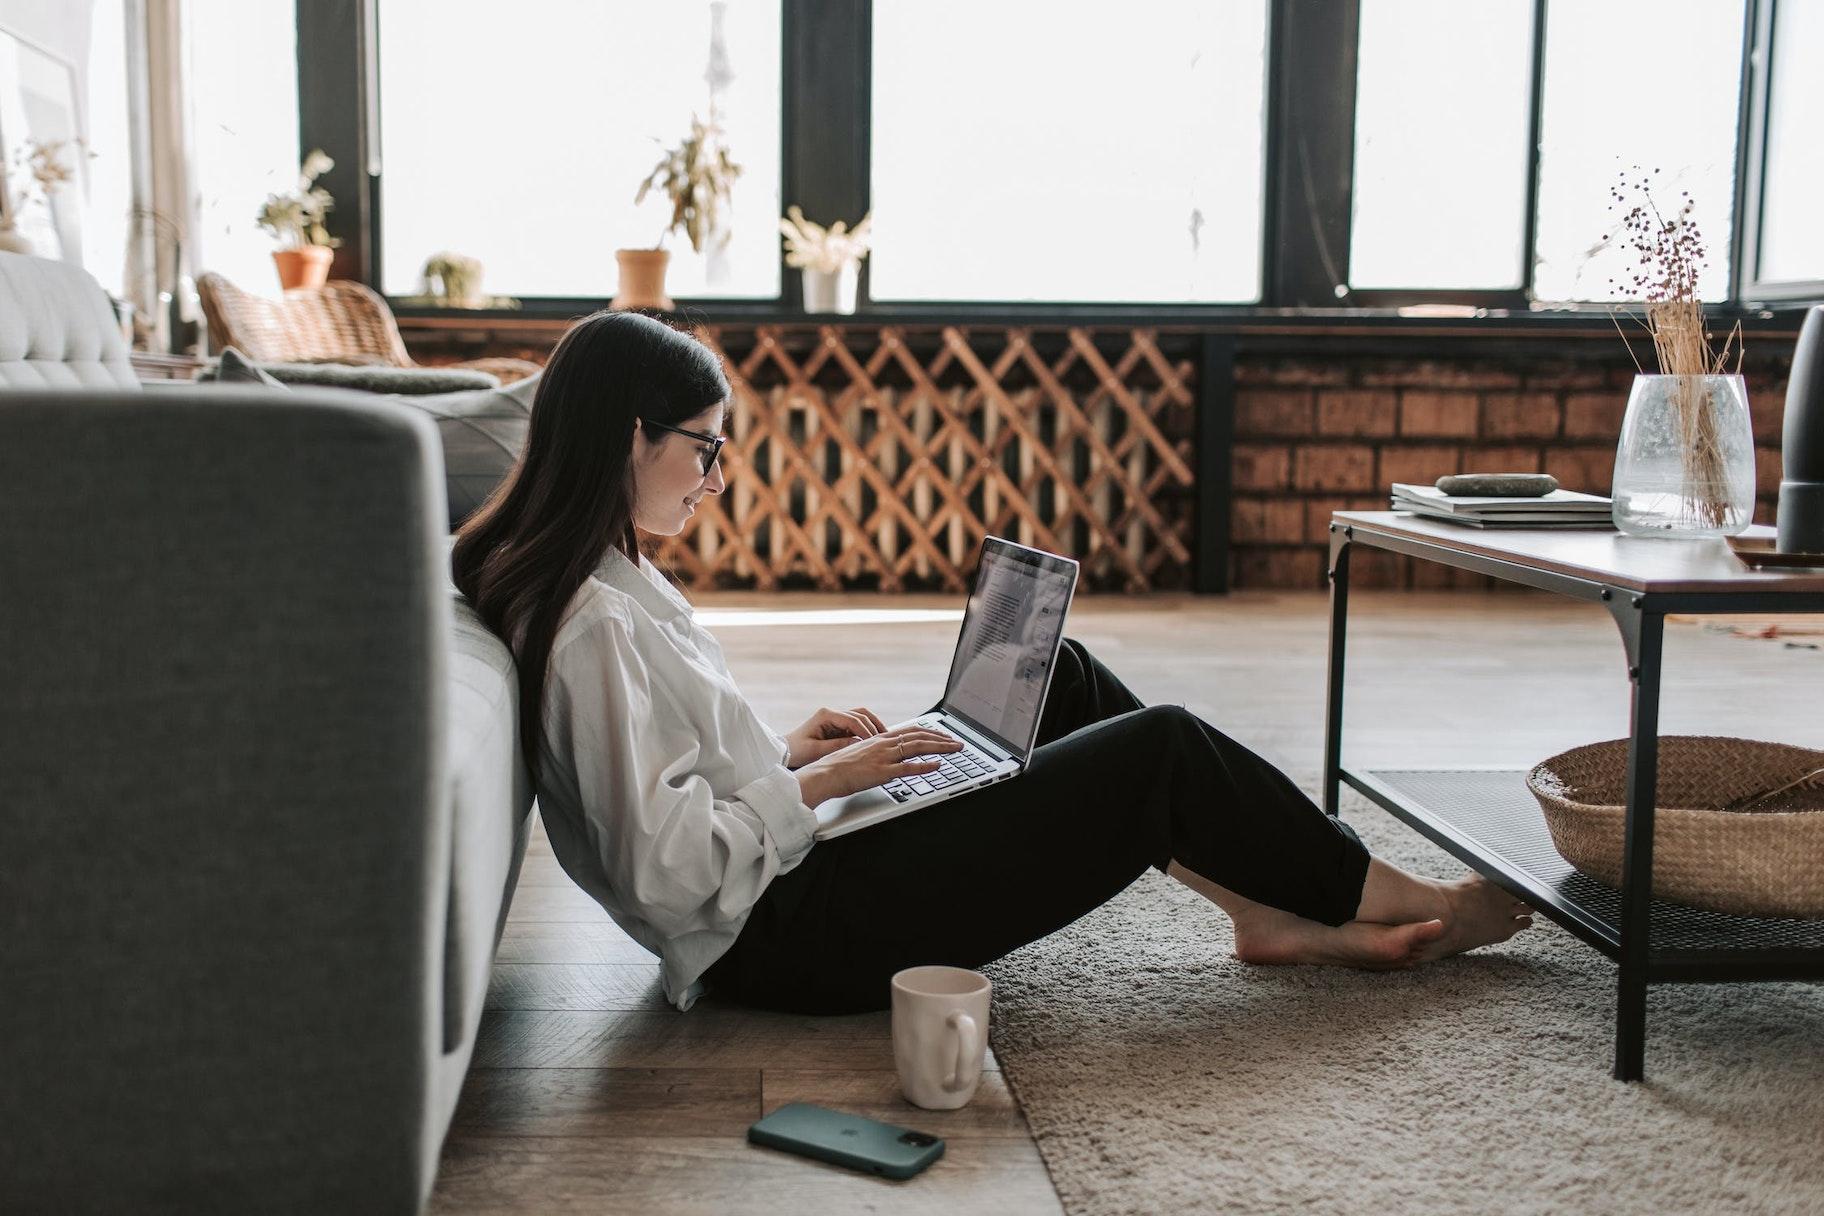 Frau am Laptop sitzend